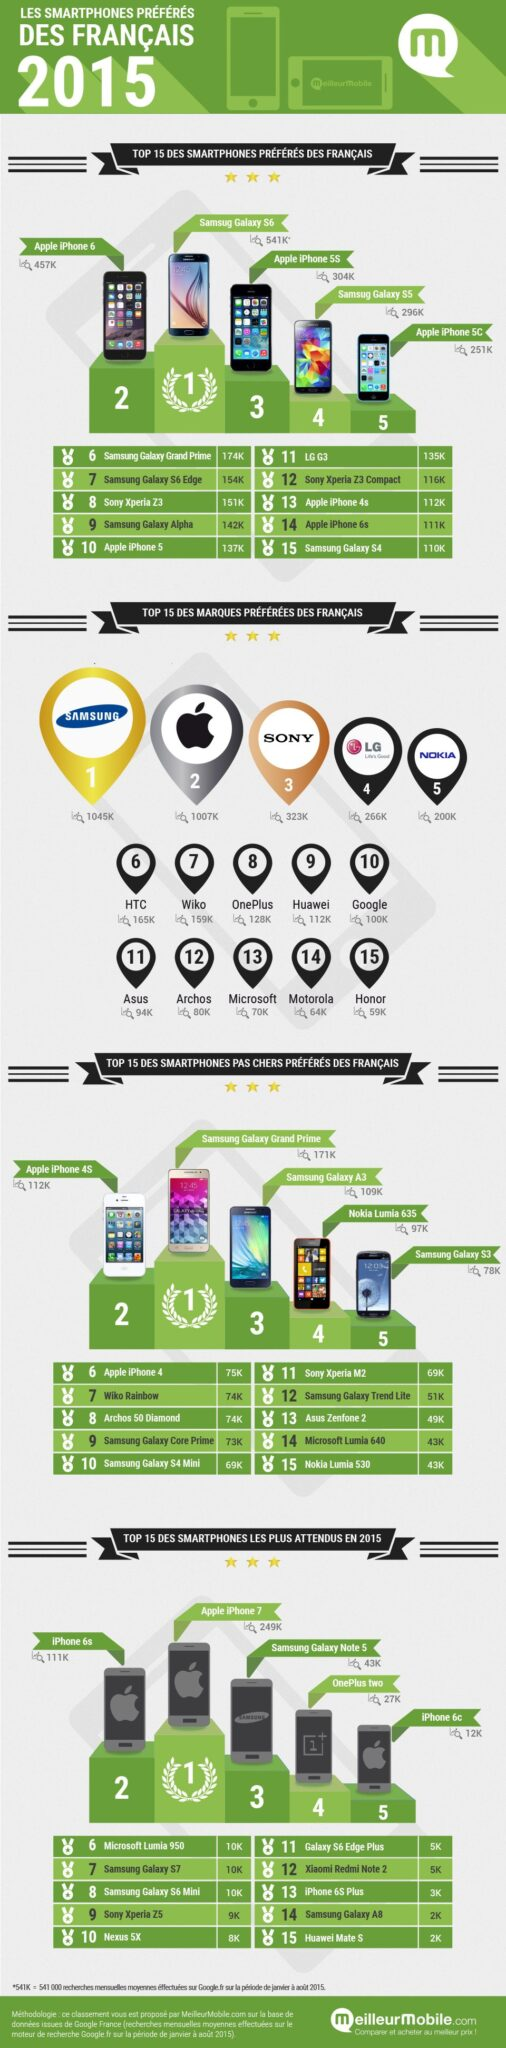 Infographie_Meilleurmobile_Smartphones_2015